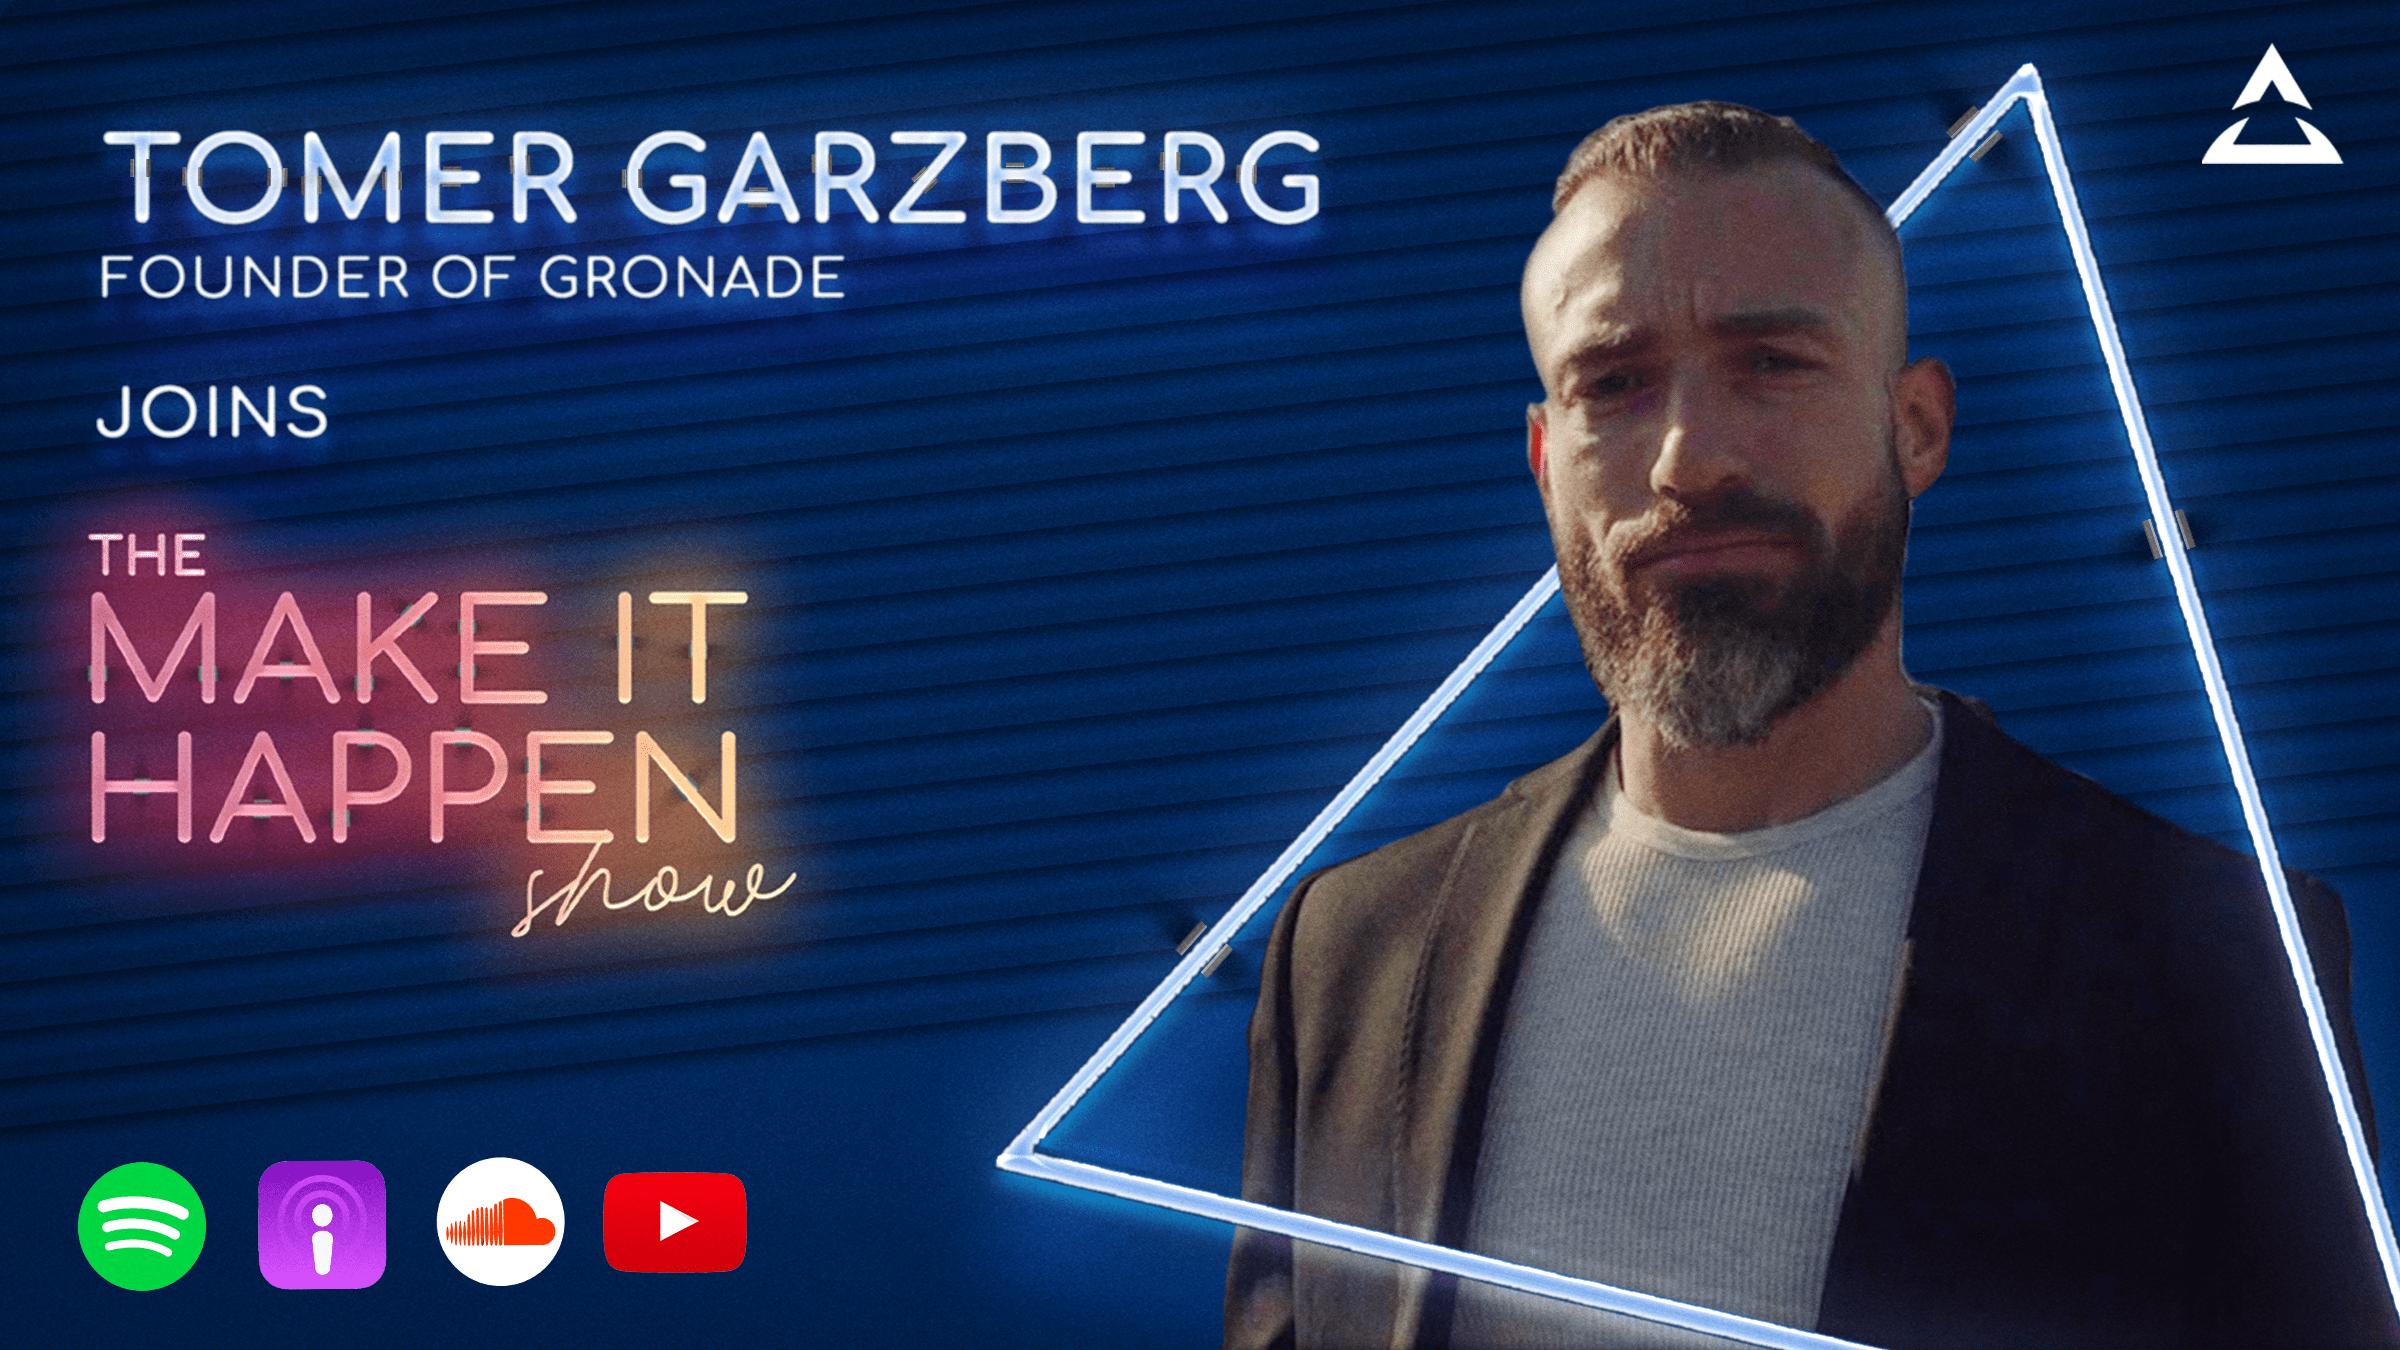 12. Tomer Garzberg promotional image for The Make It Happen Show